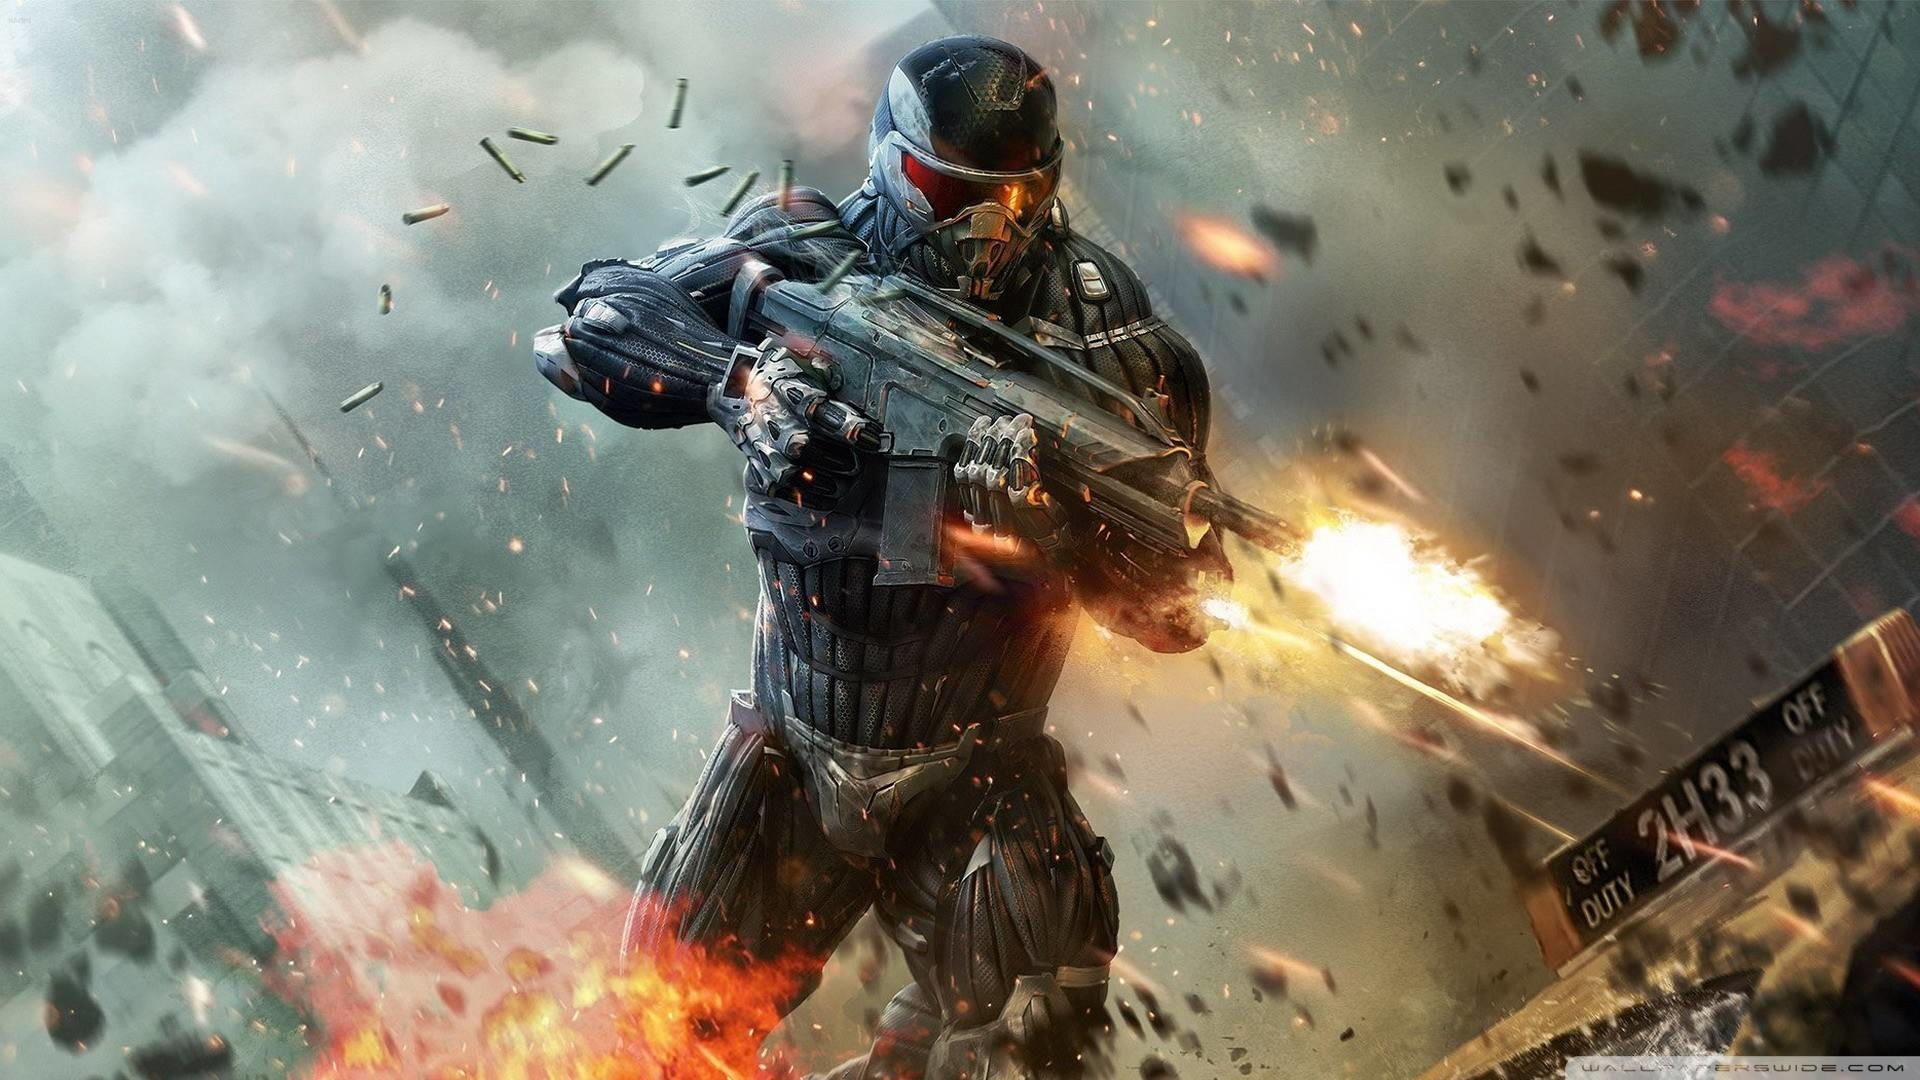 Crysis 2 Wallpapers in full 1080P HD Â« GamingBolt.com: Video Game .